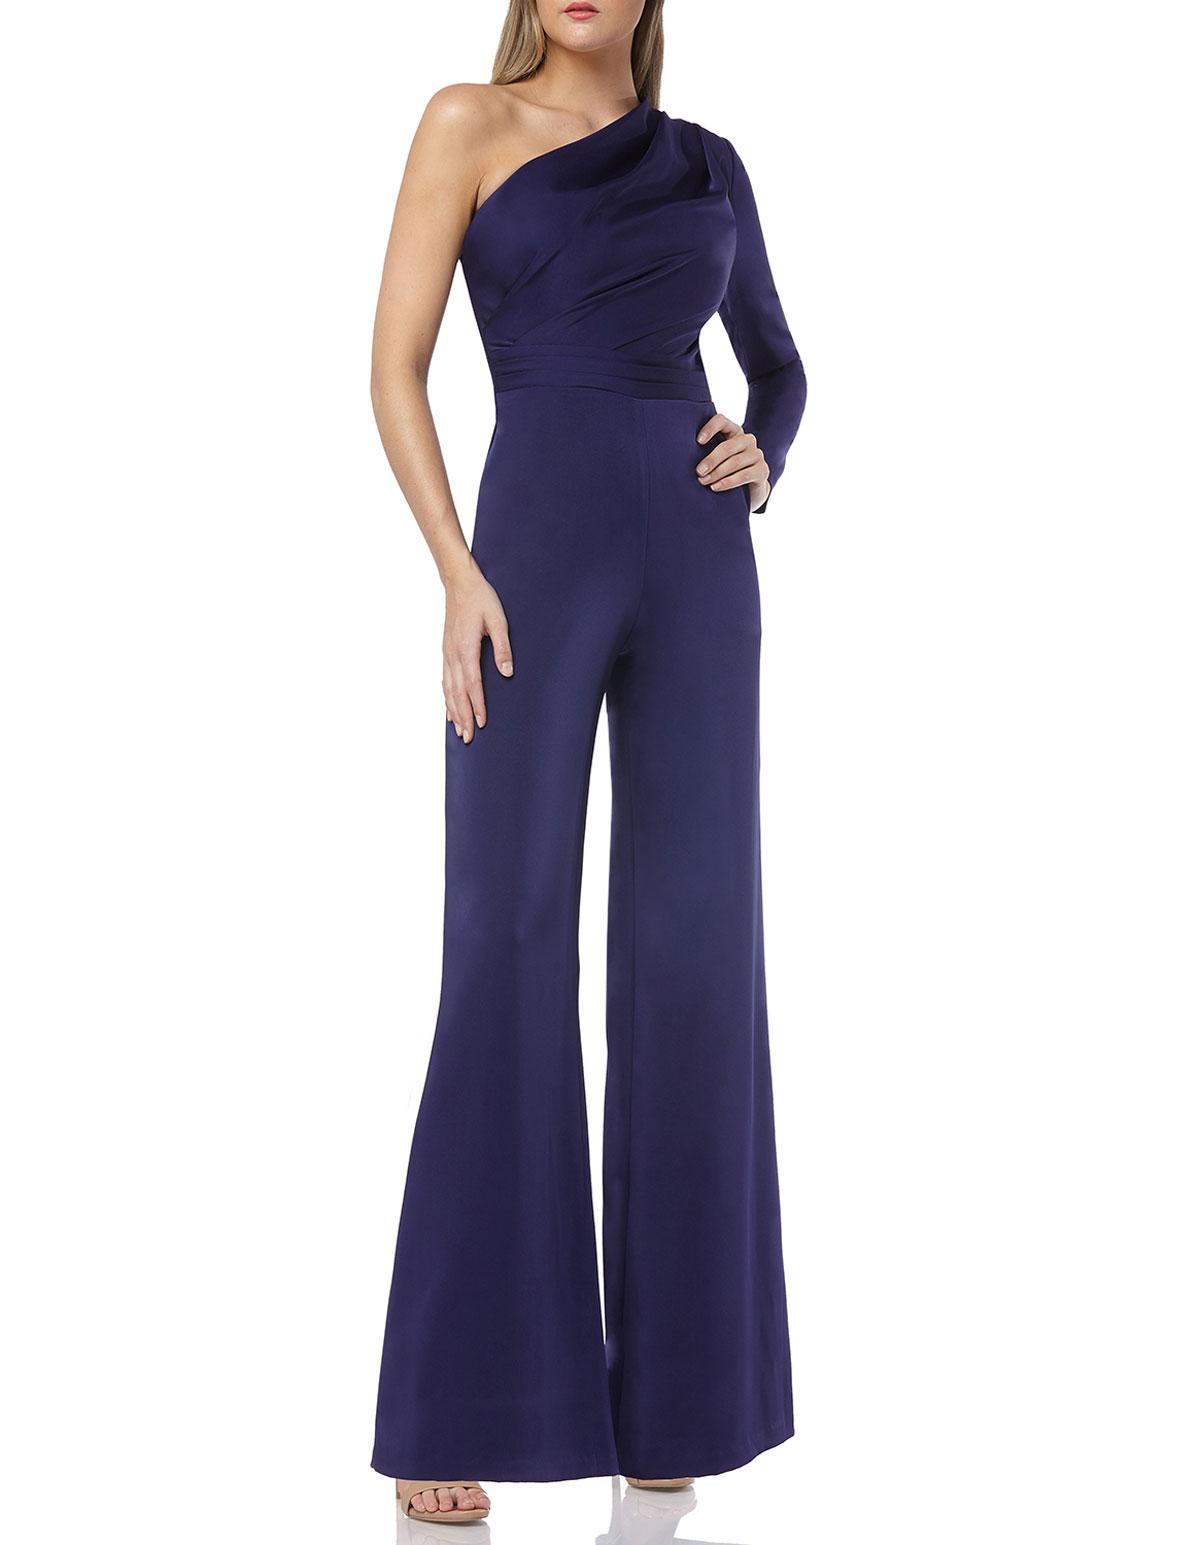 Kay Unger Suits One-Shoulder Draped Palazzo Jumpsuit, BLUE